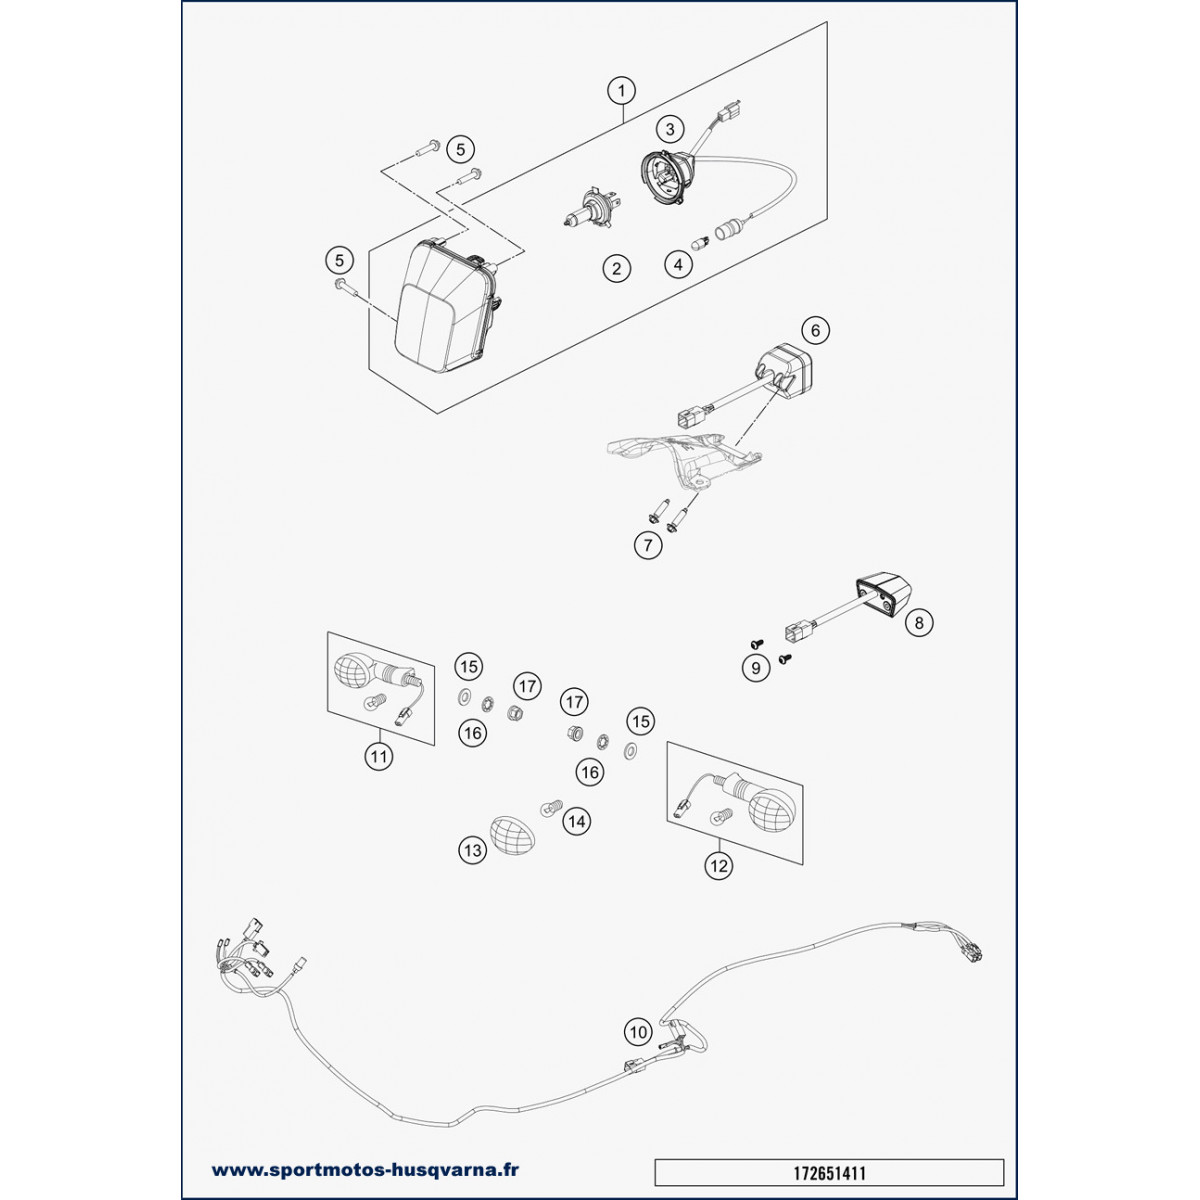 hight resolution of turn signal wiring harness husqvarna fe 250 2019